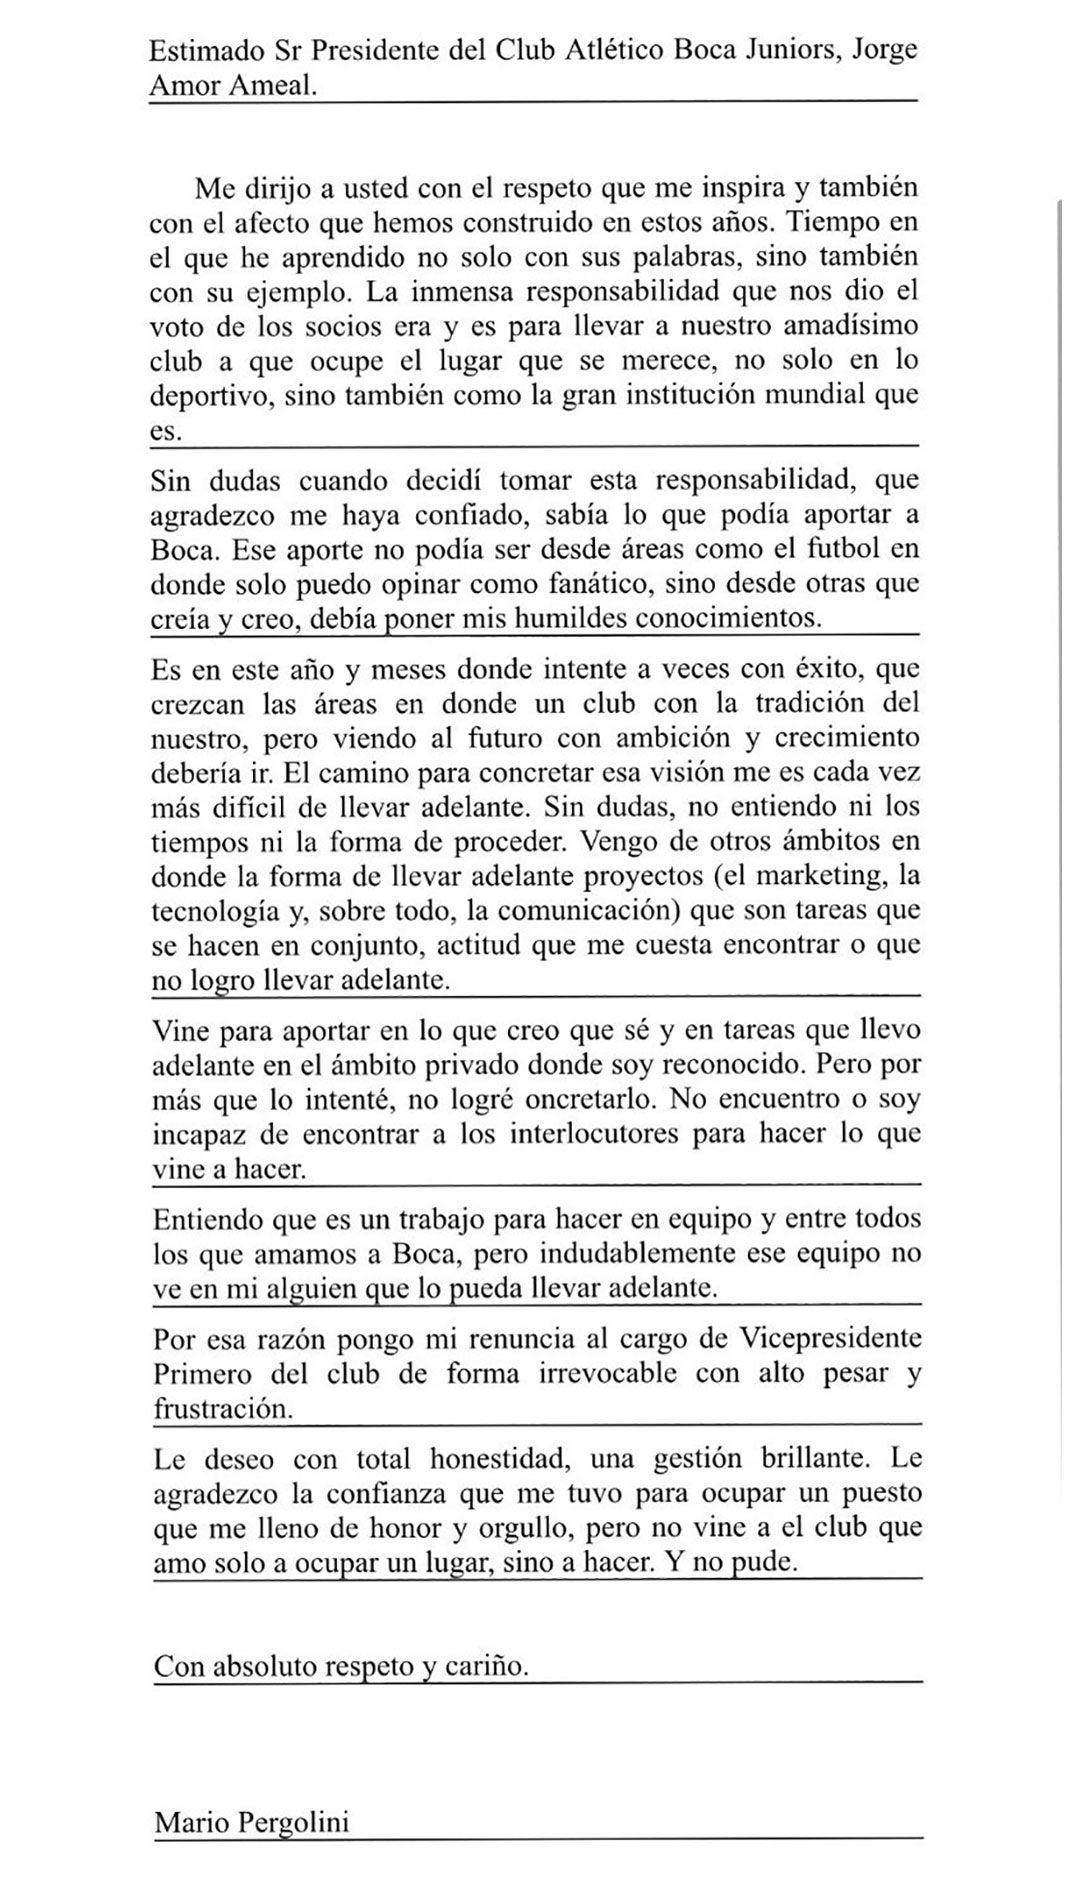 la carta de renuncia de Pergolini a la vicepresidencia de Boca